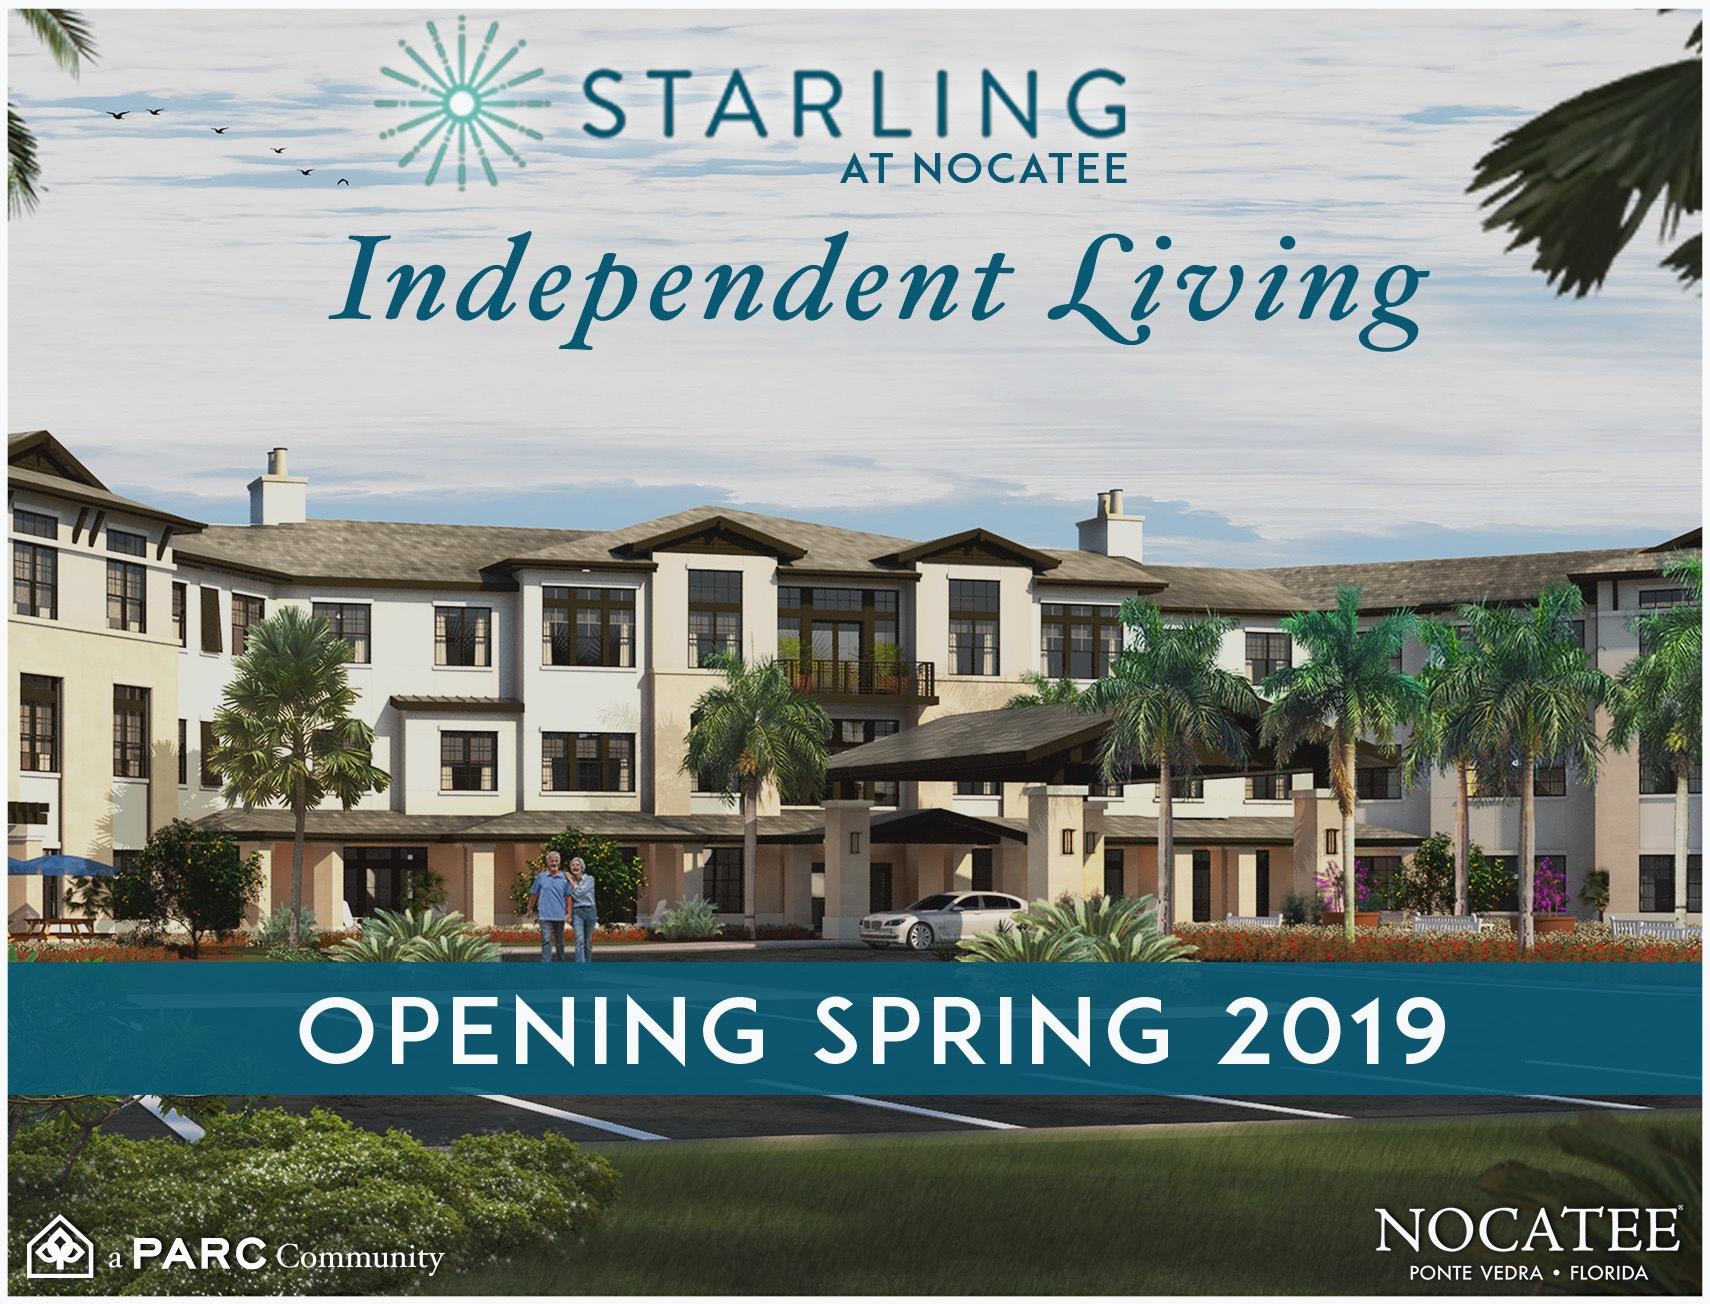 Starling at Nocatee